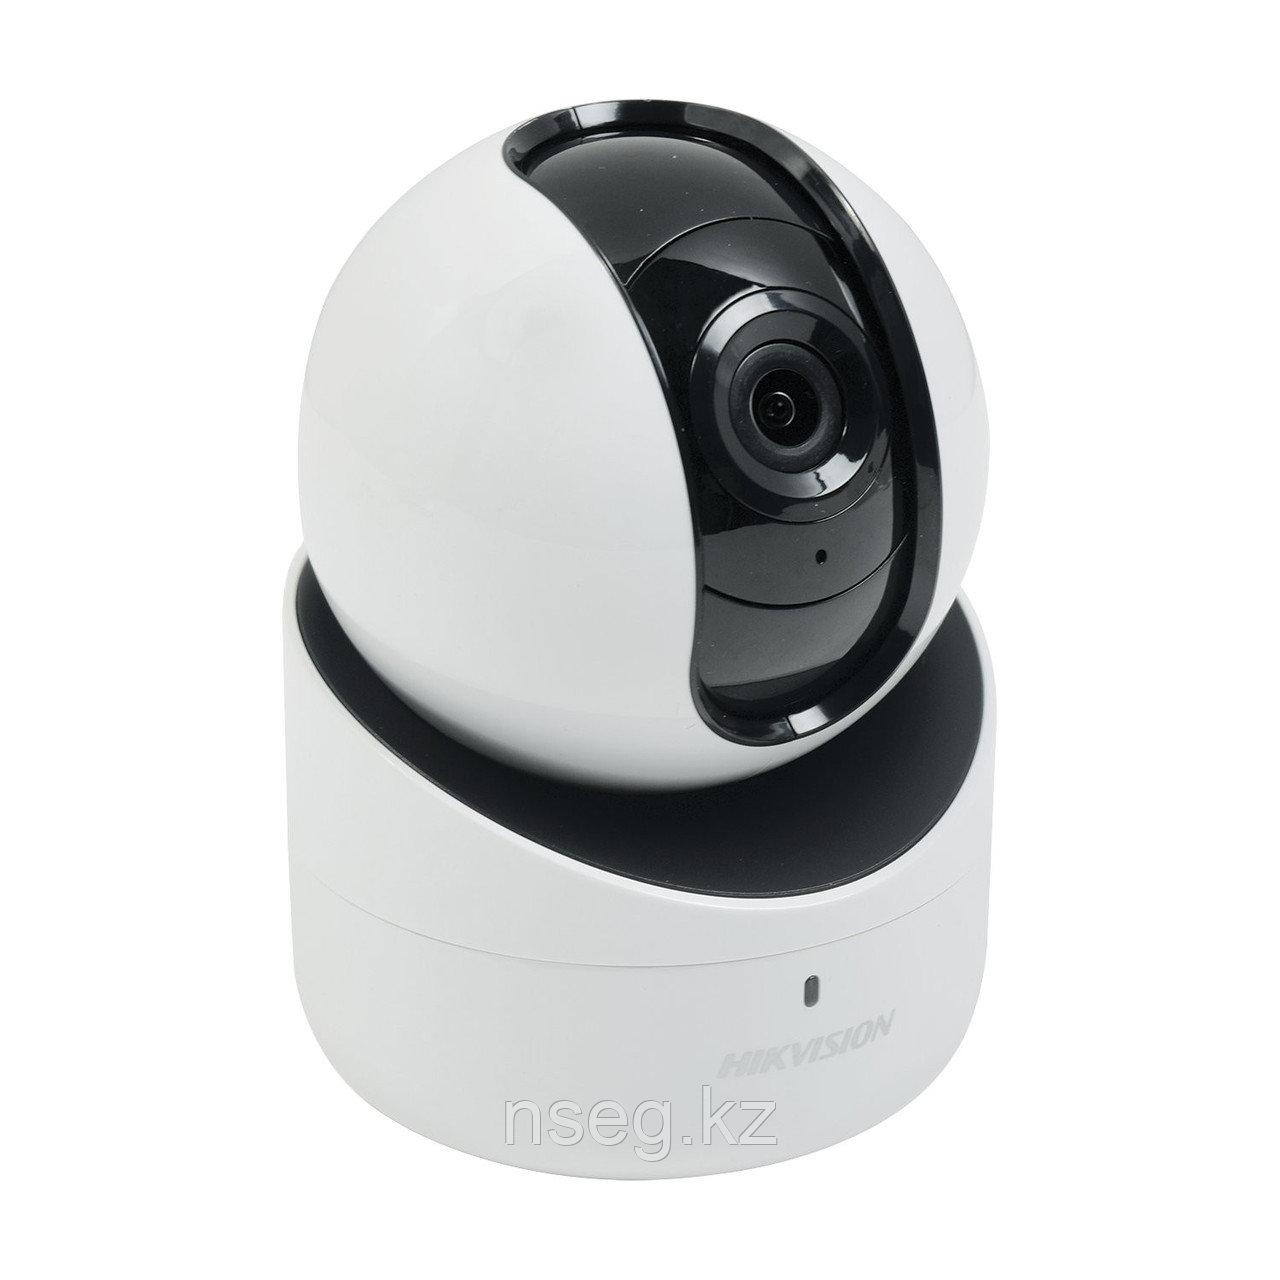 3Мп поворотная IP камера Hikvision DS-2DE7320IW-AE